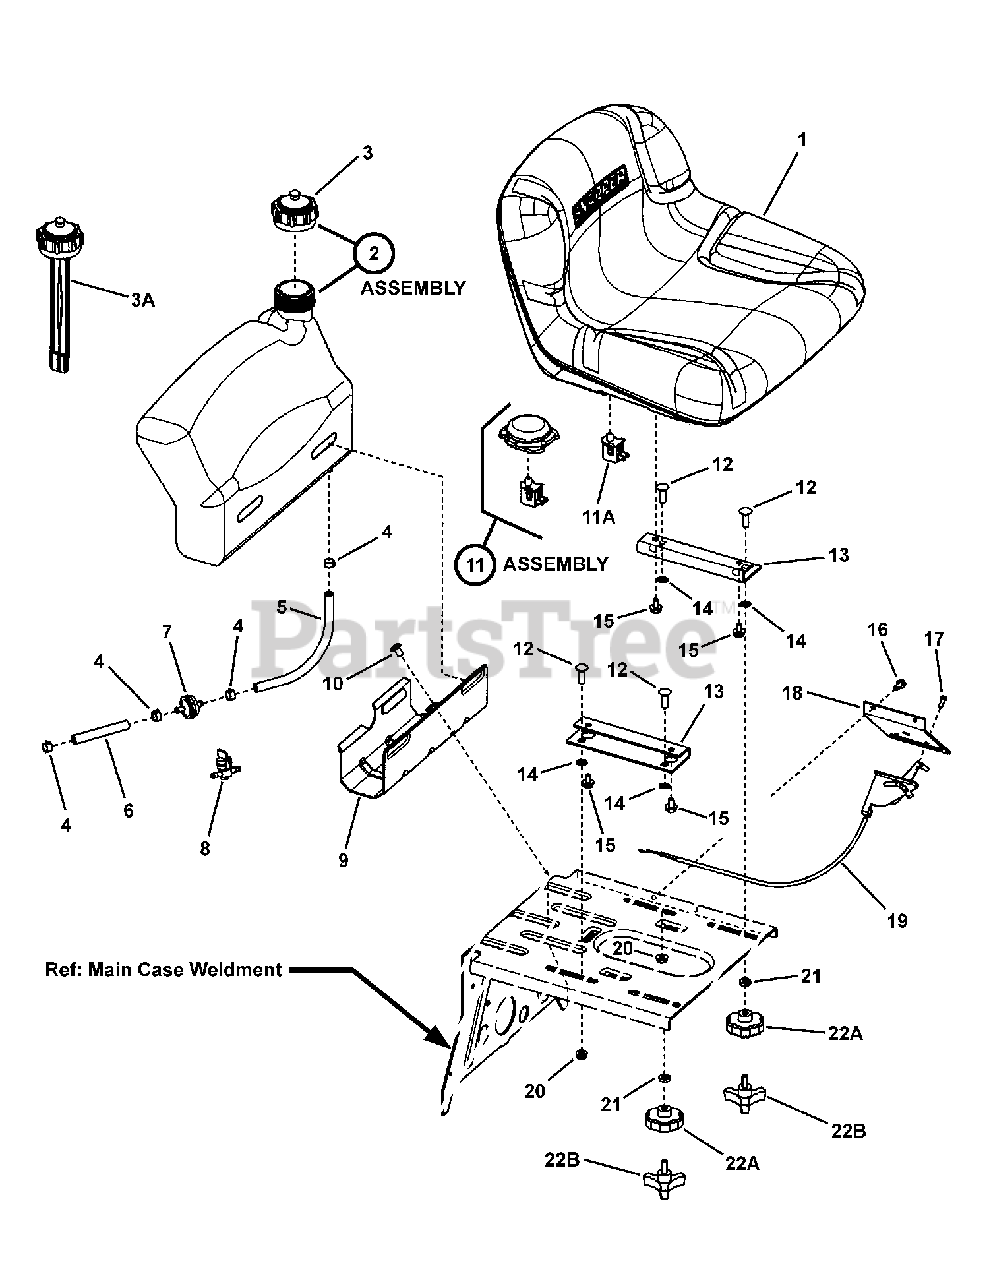 Fuel Pump Valve For 12HP Snapper 281223BVE Rider Mower